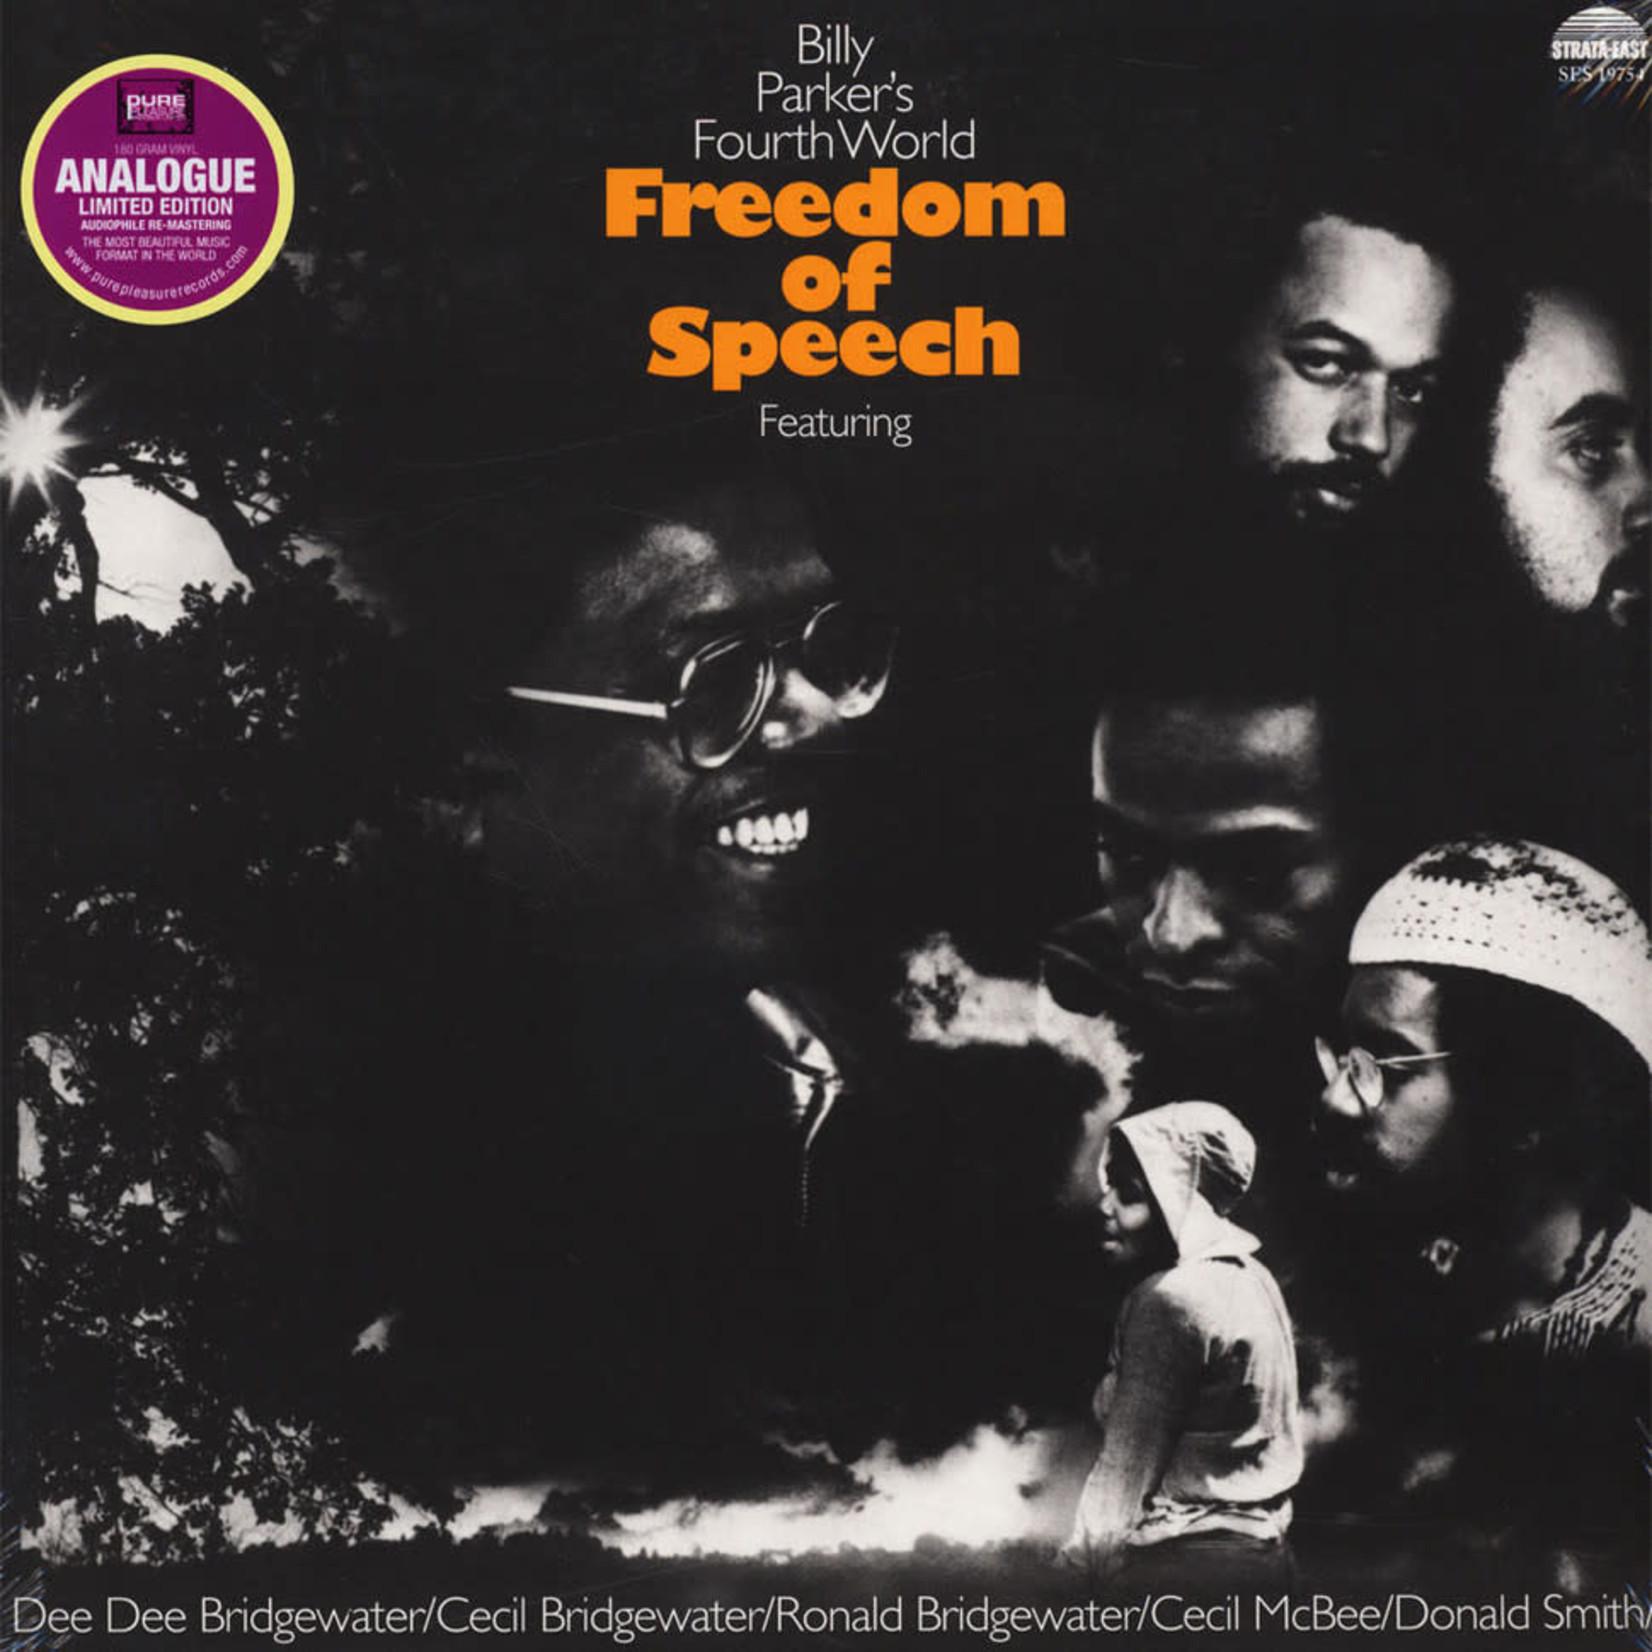 [New] Parker, Billy's Fourth World: Freedom of Speech